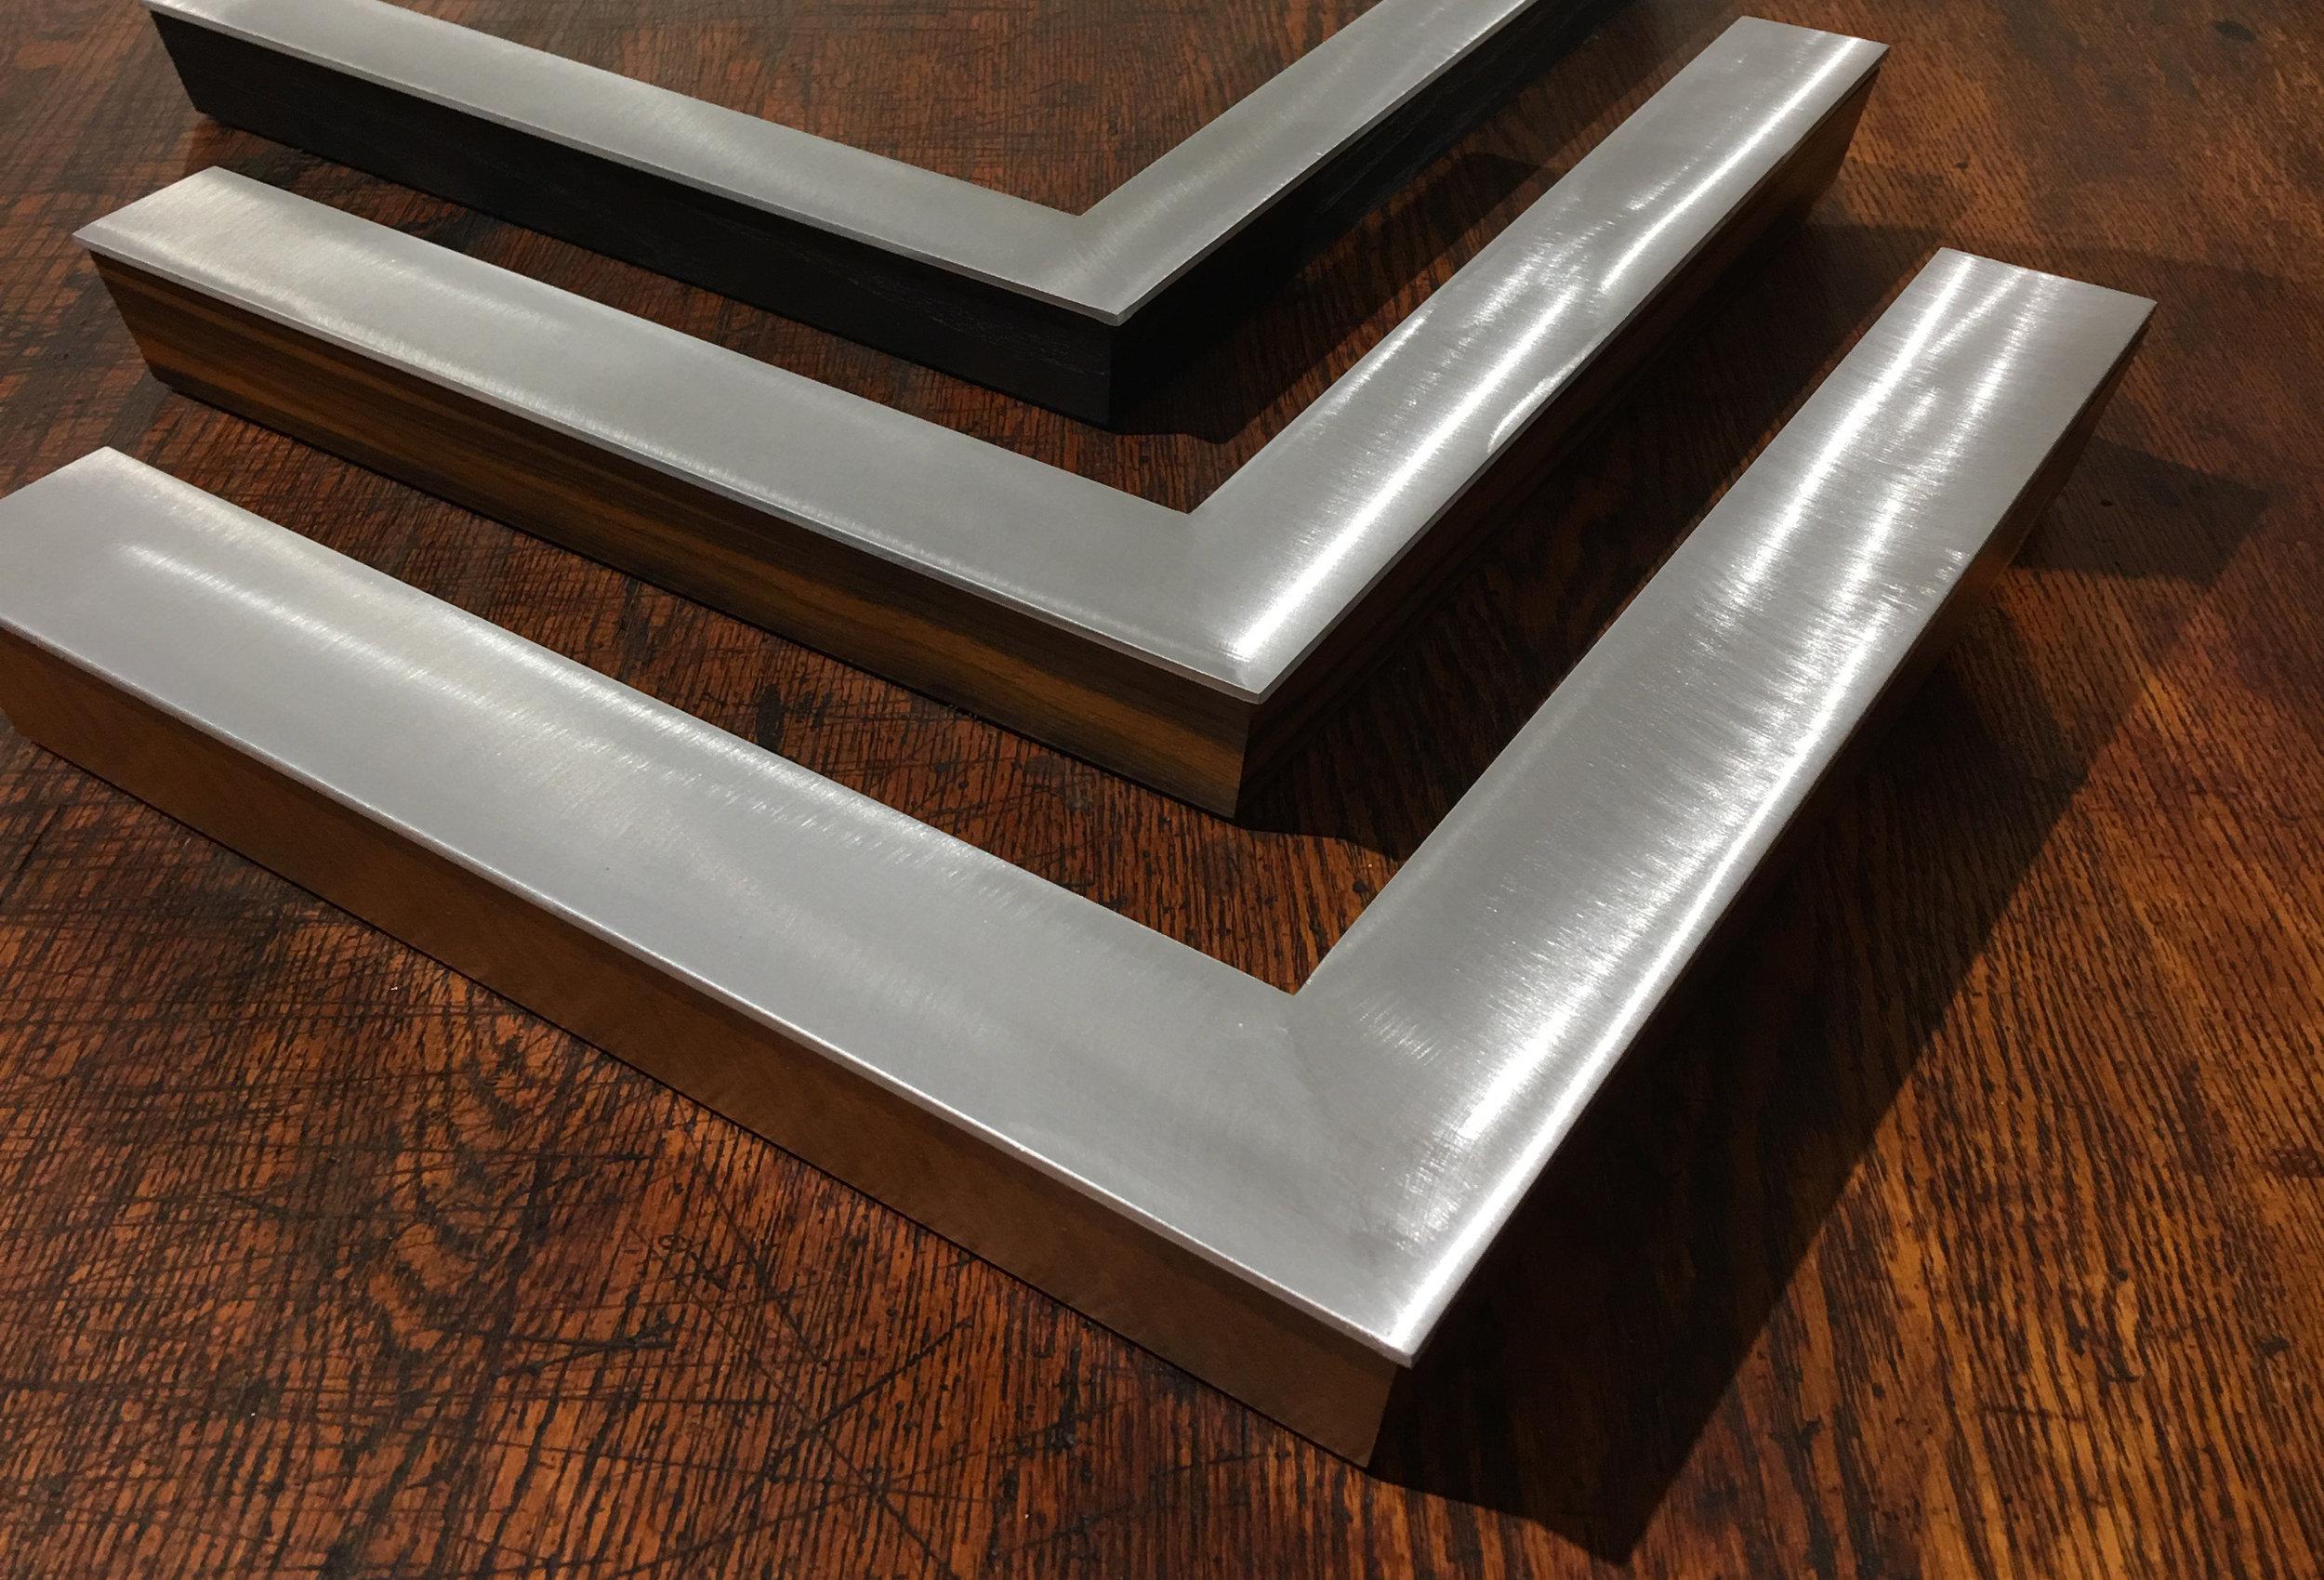 metallic_frames.jpg